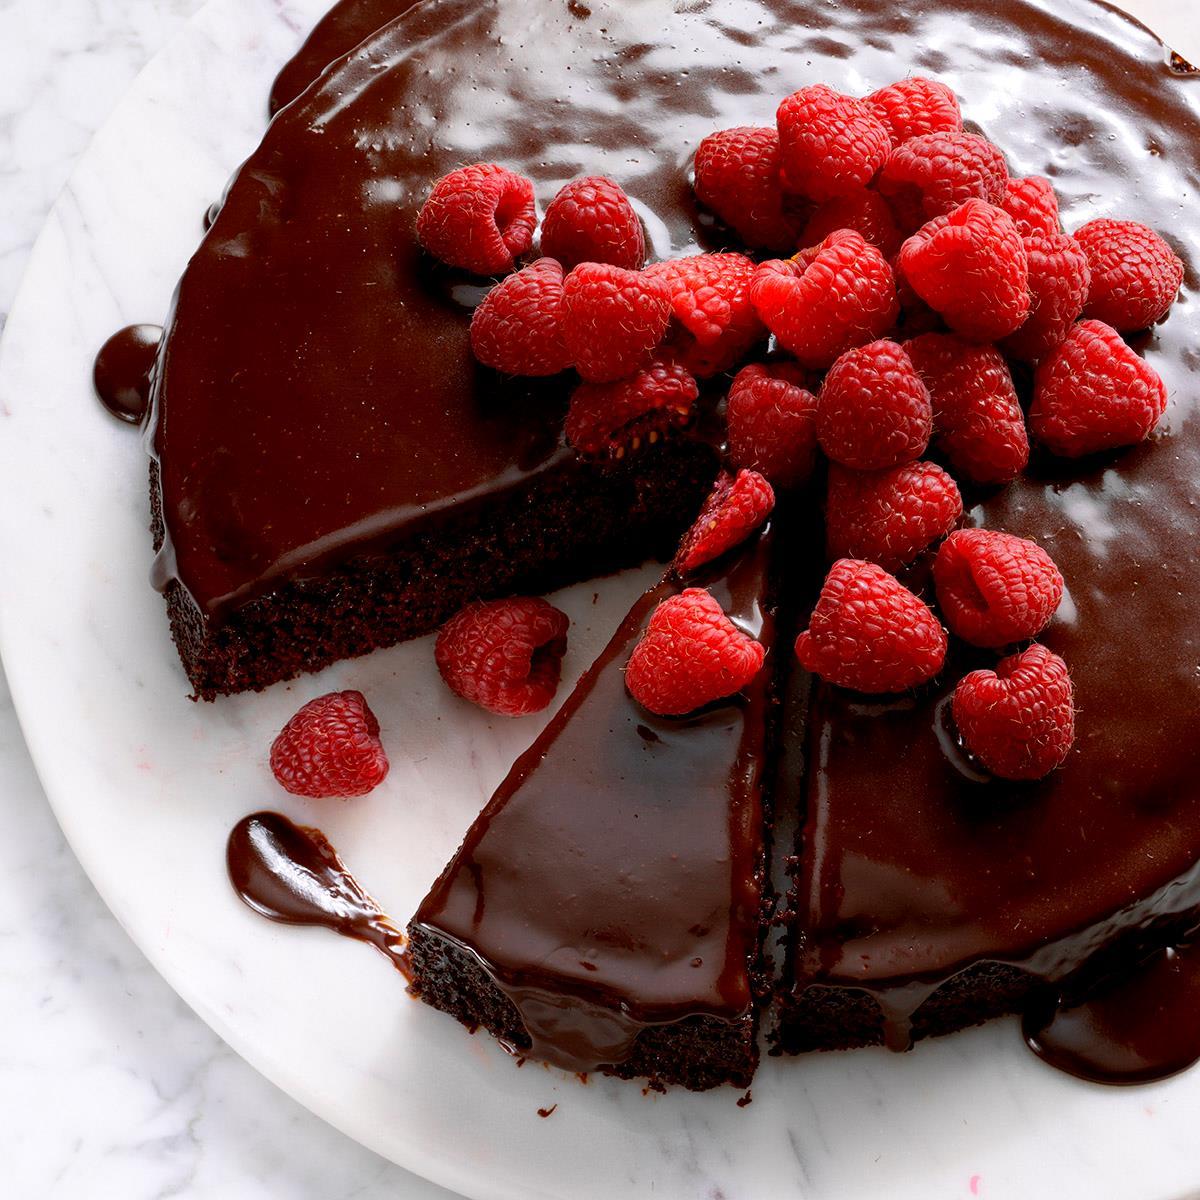 Ganache Topped Chocolate Cake